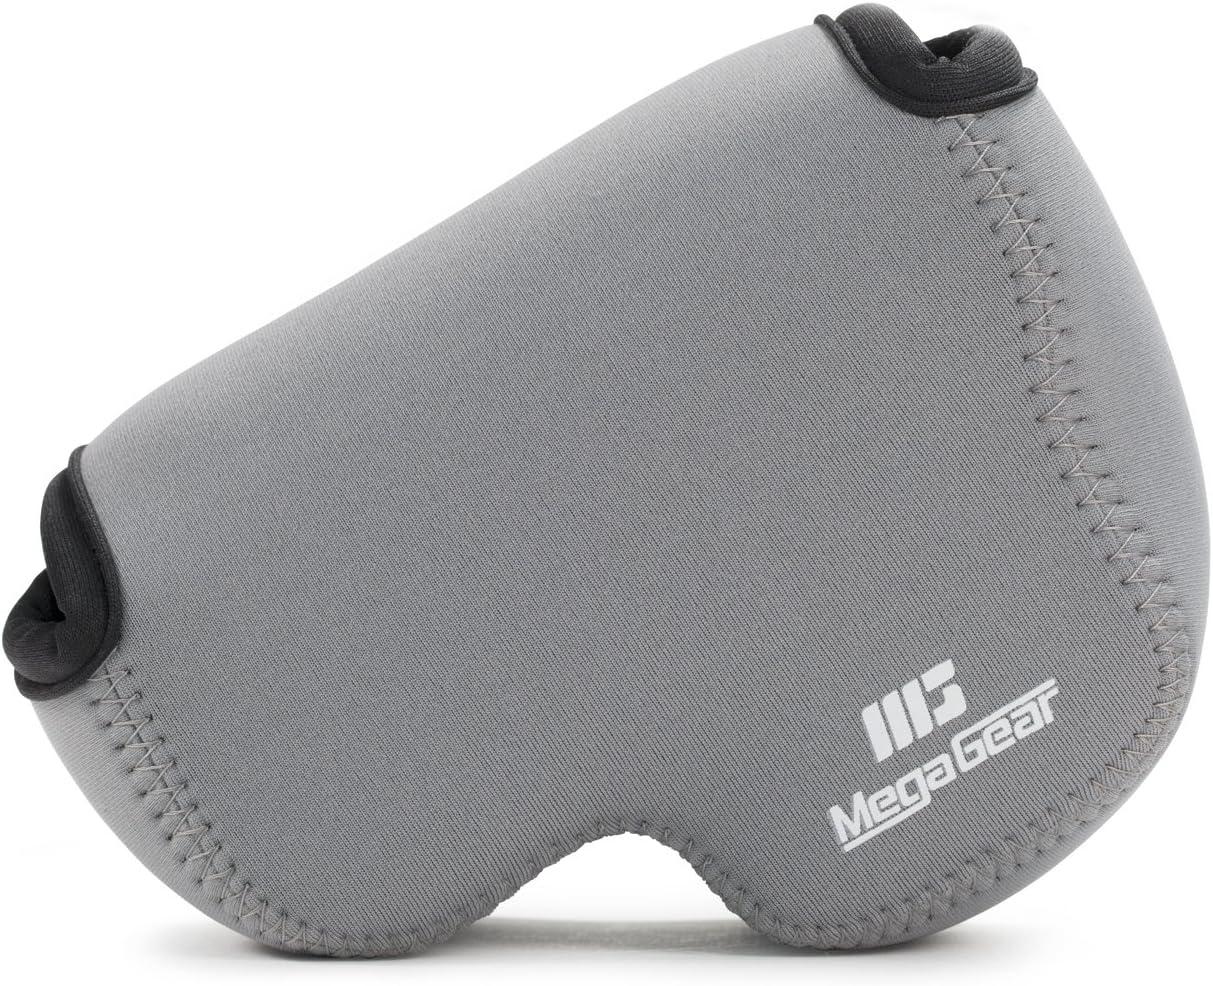 Megagear Nikon Coolpix B500 Ultraleichte Kameratasche Kamera